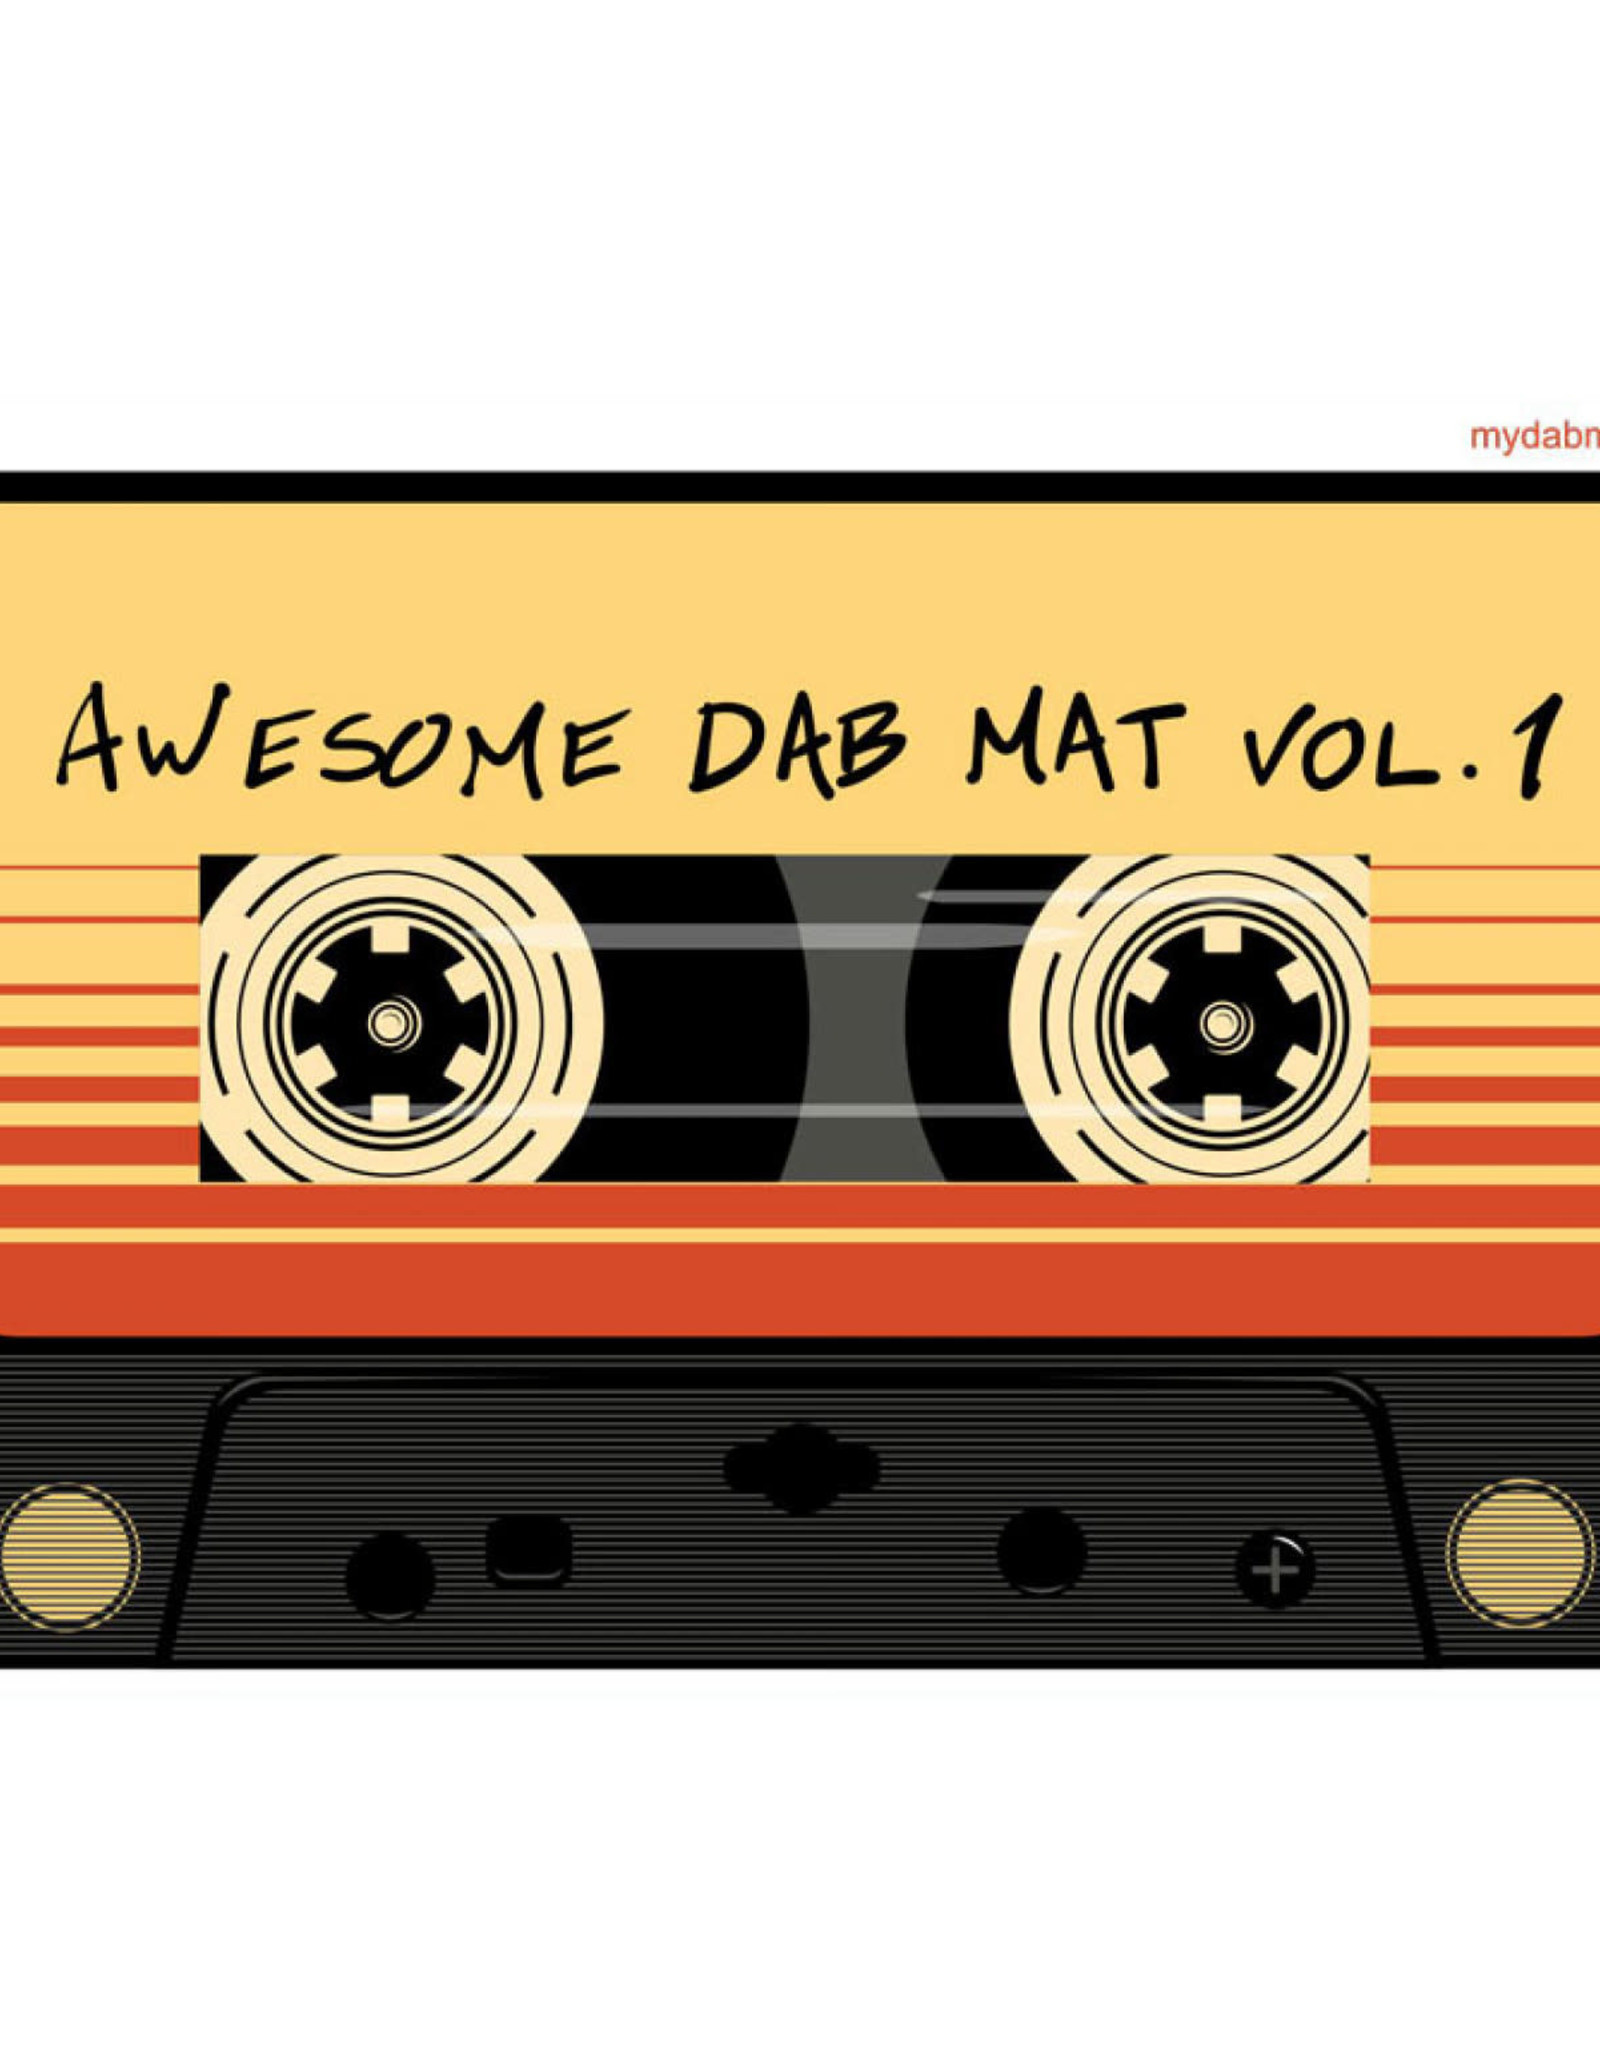 "11"" x 8.5"" Mix Tape Dab Mat by My Dab Mat"